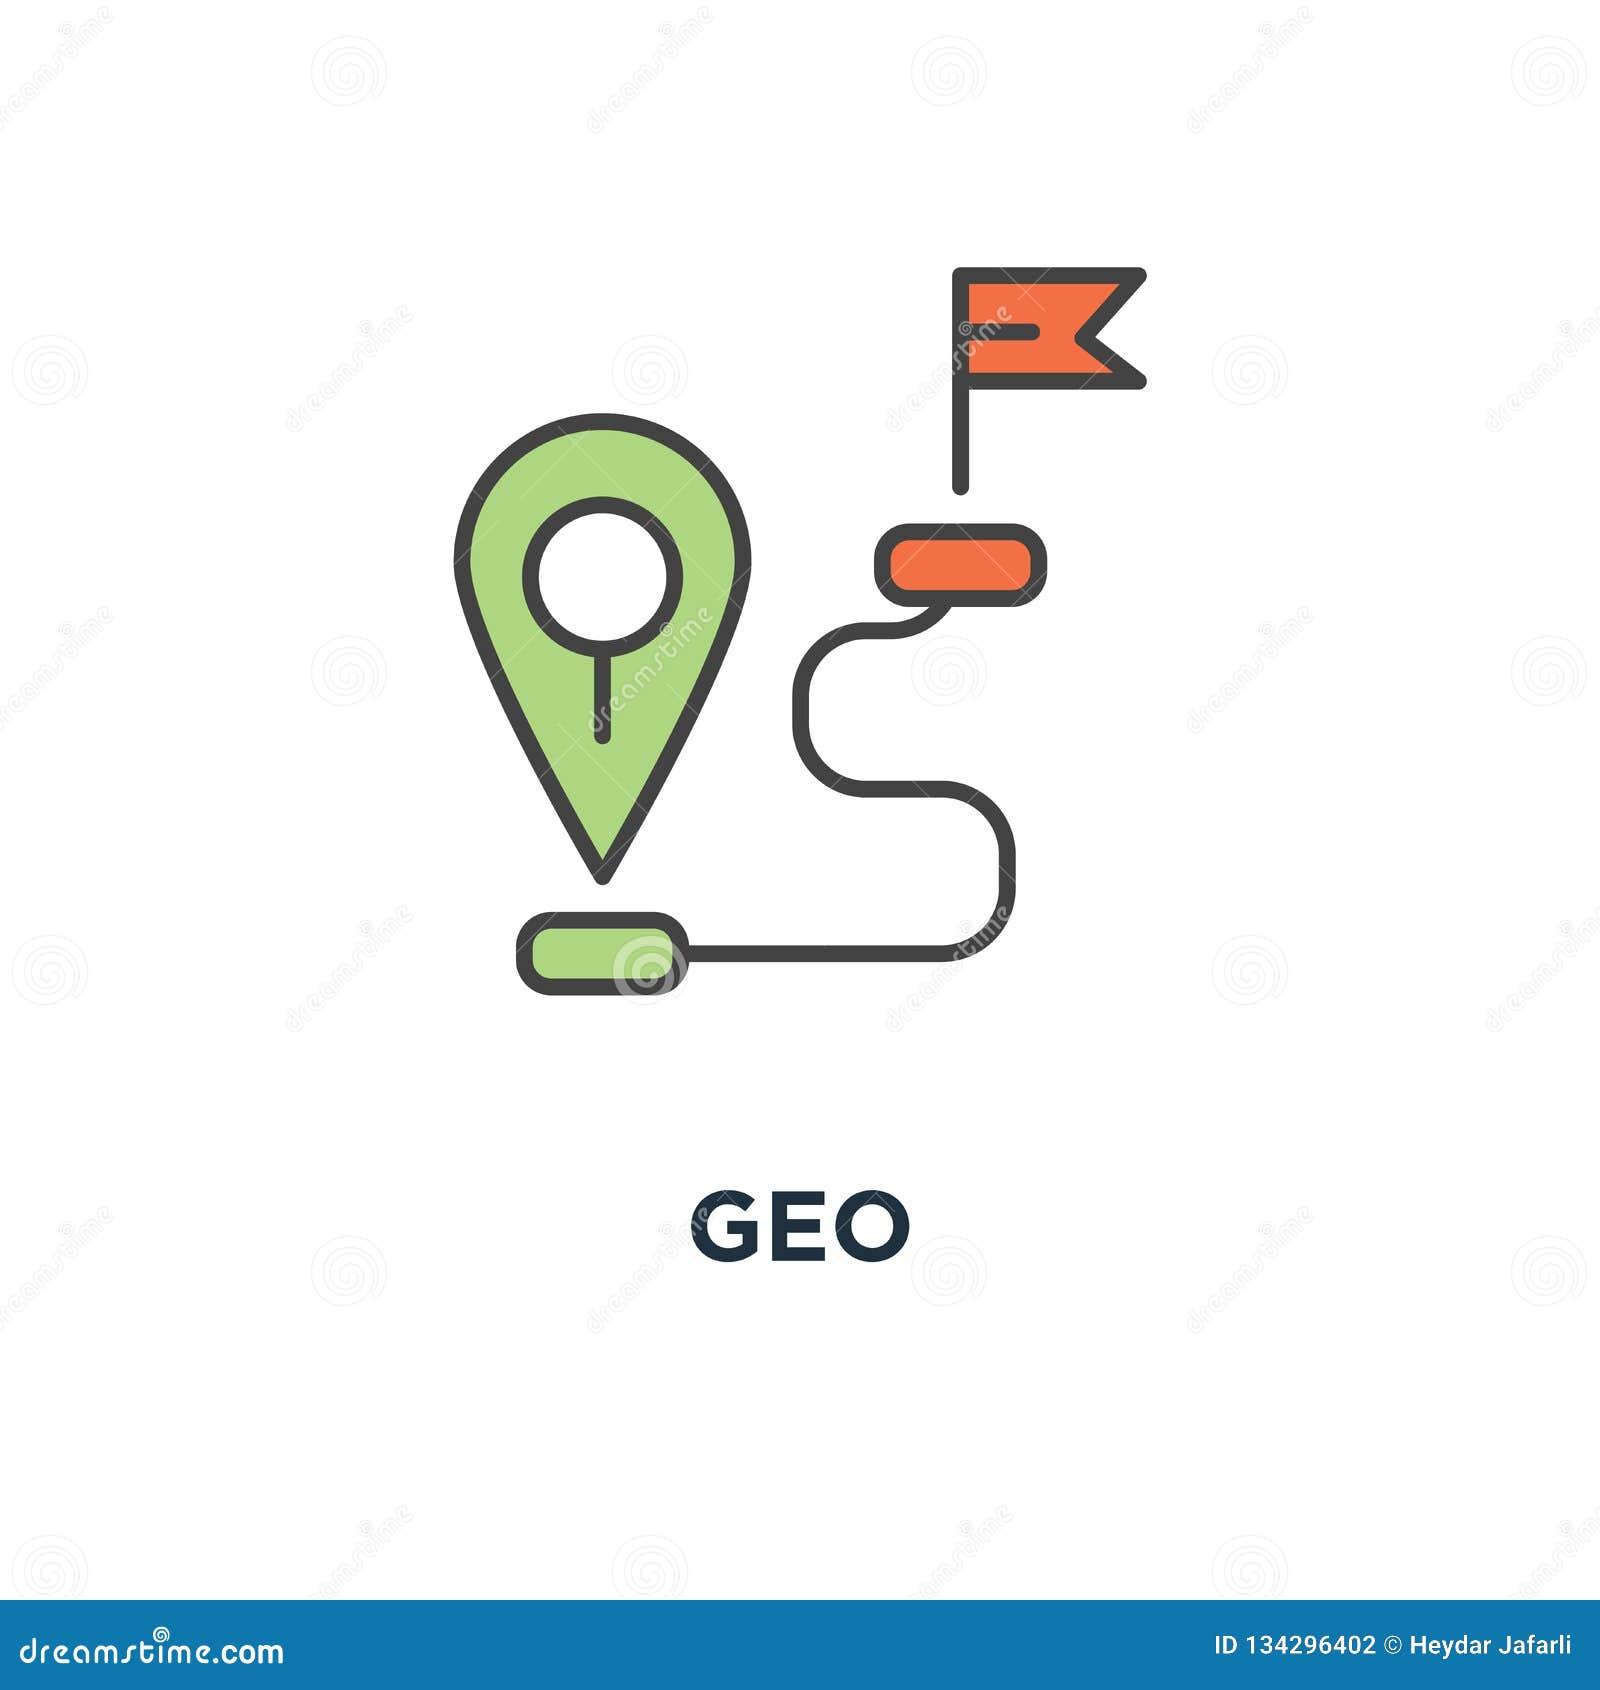 Geo Icon  Gps Location Tag Or Pointer Concept Symbol Design